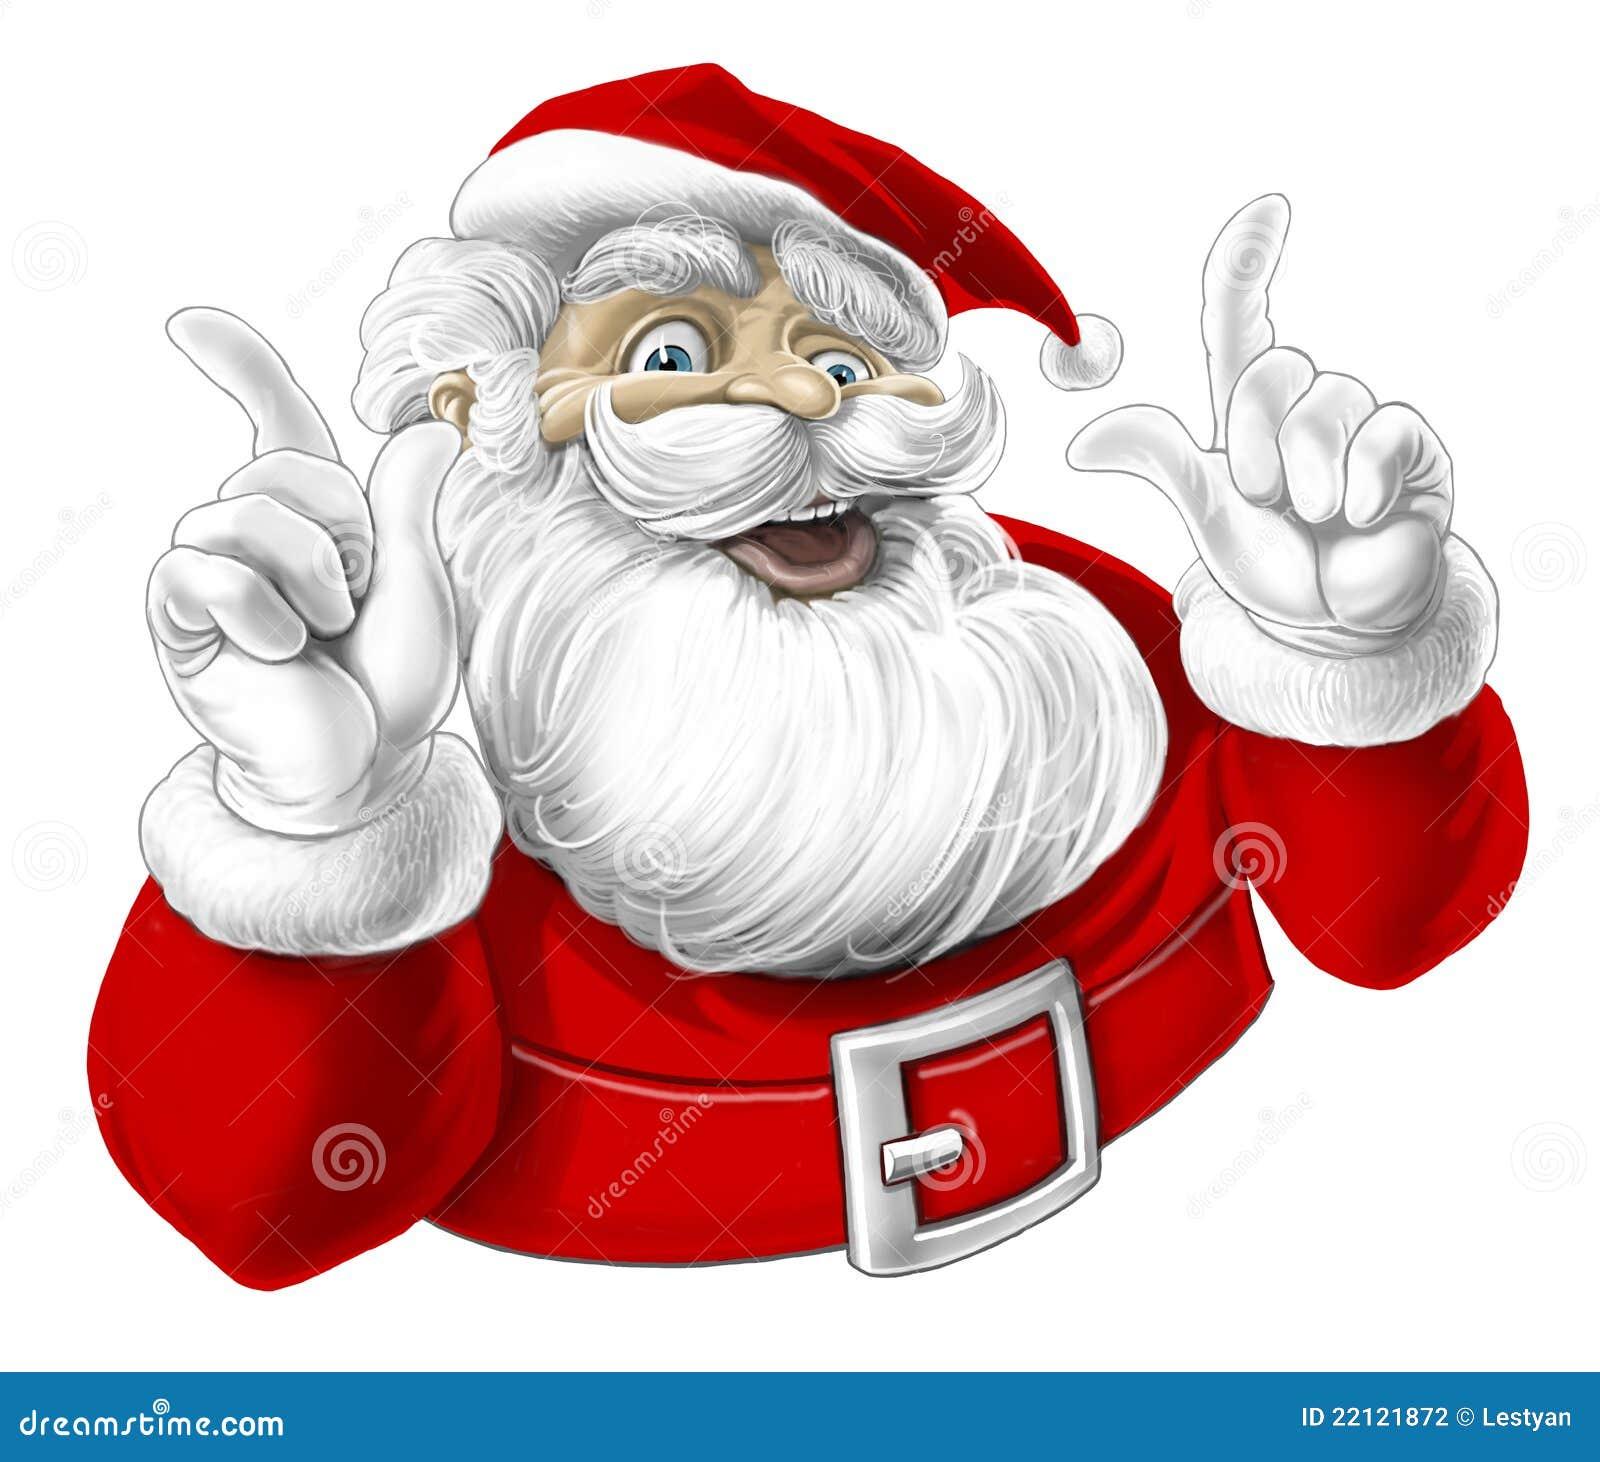 Funny Santa Claus Singing Laughing